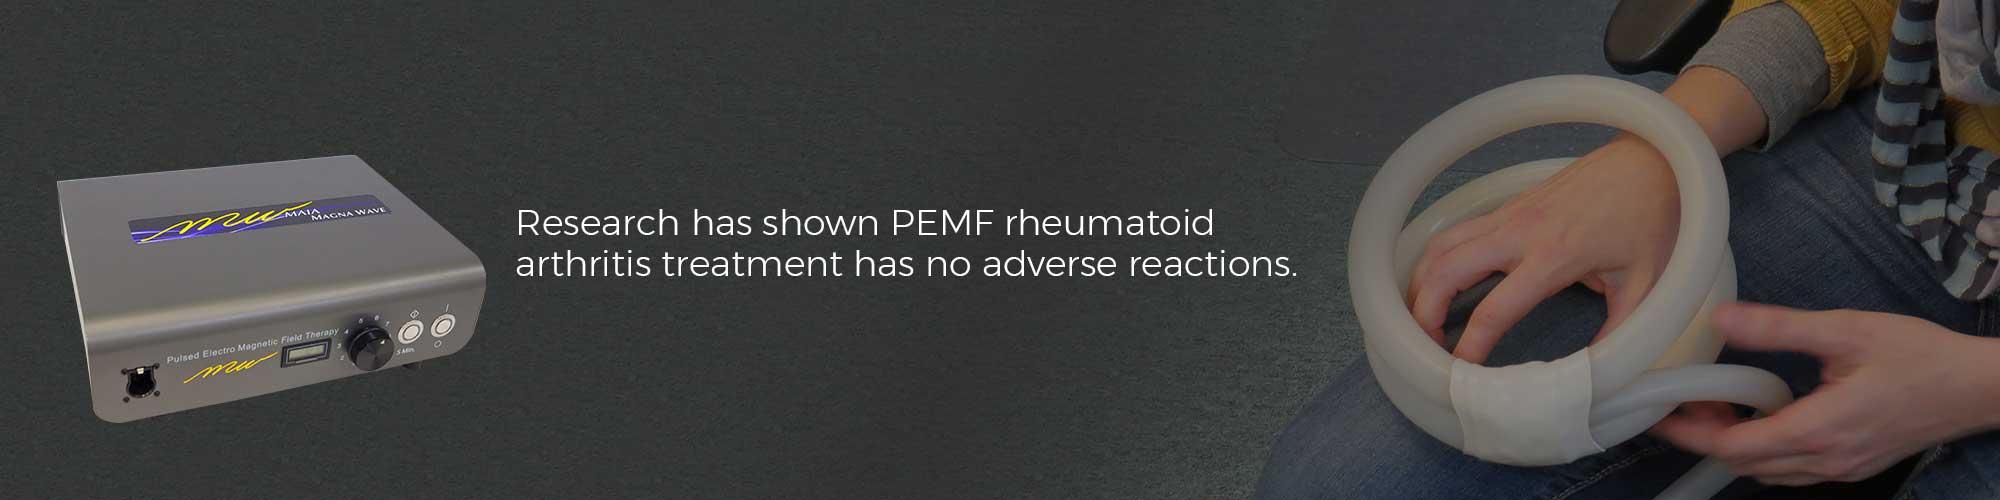 Research has shown PEMF rheumatoid arthritis treatment has no adverse reactions.